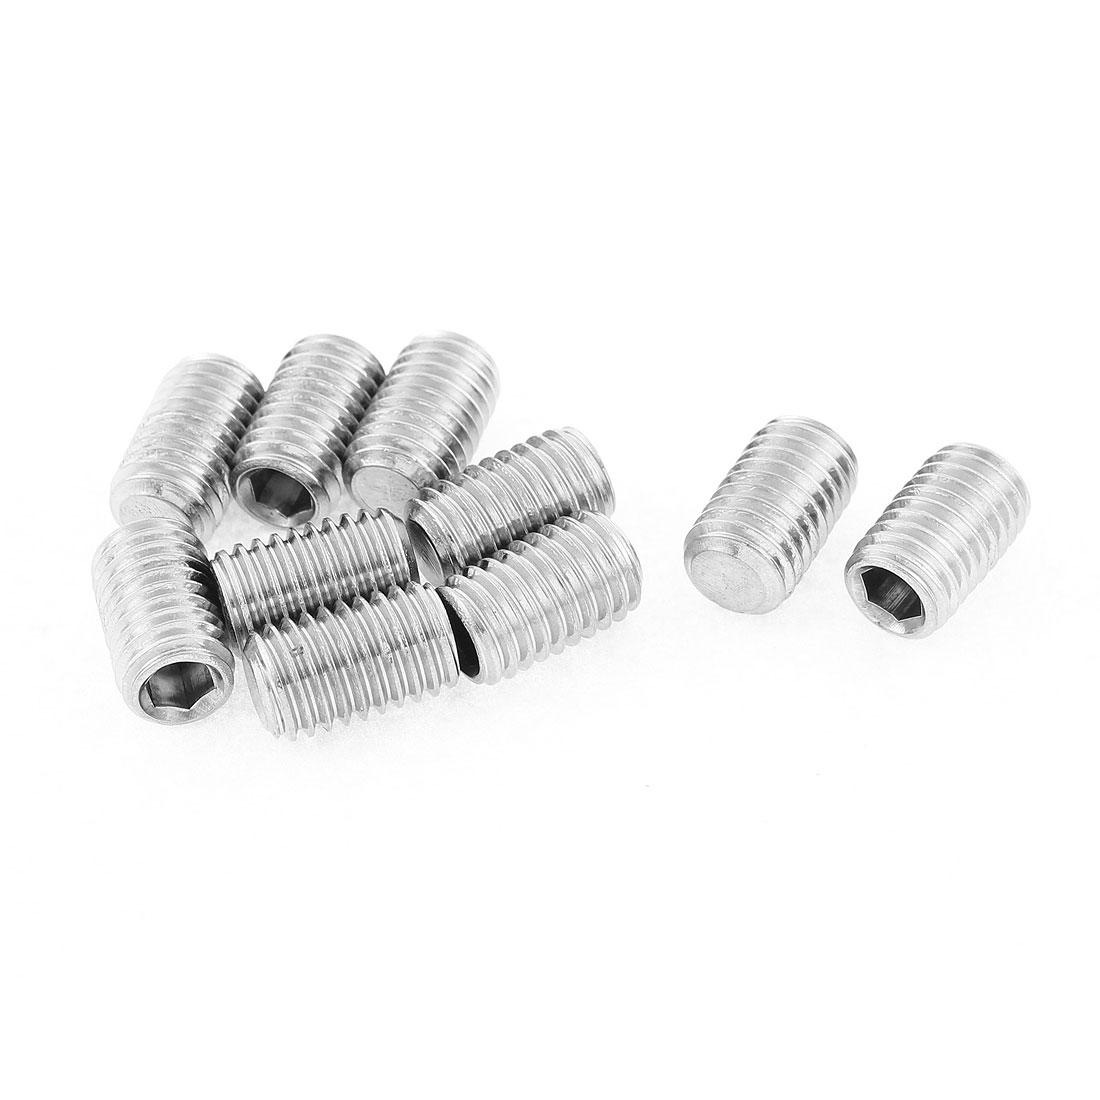 M10x16mm 1.5mm Pitch Stainless Steel Hex Socket Set Flat Point Grub Screws 10pcs